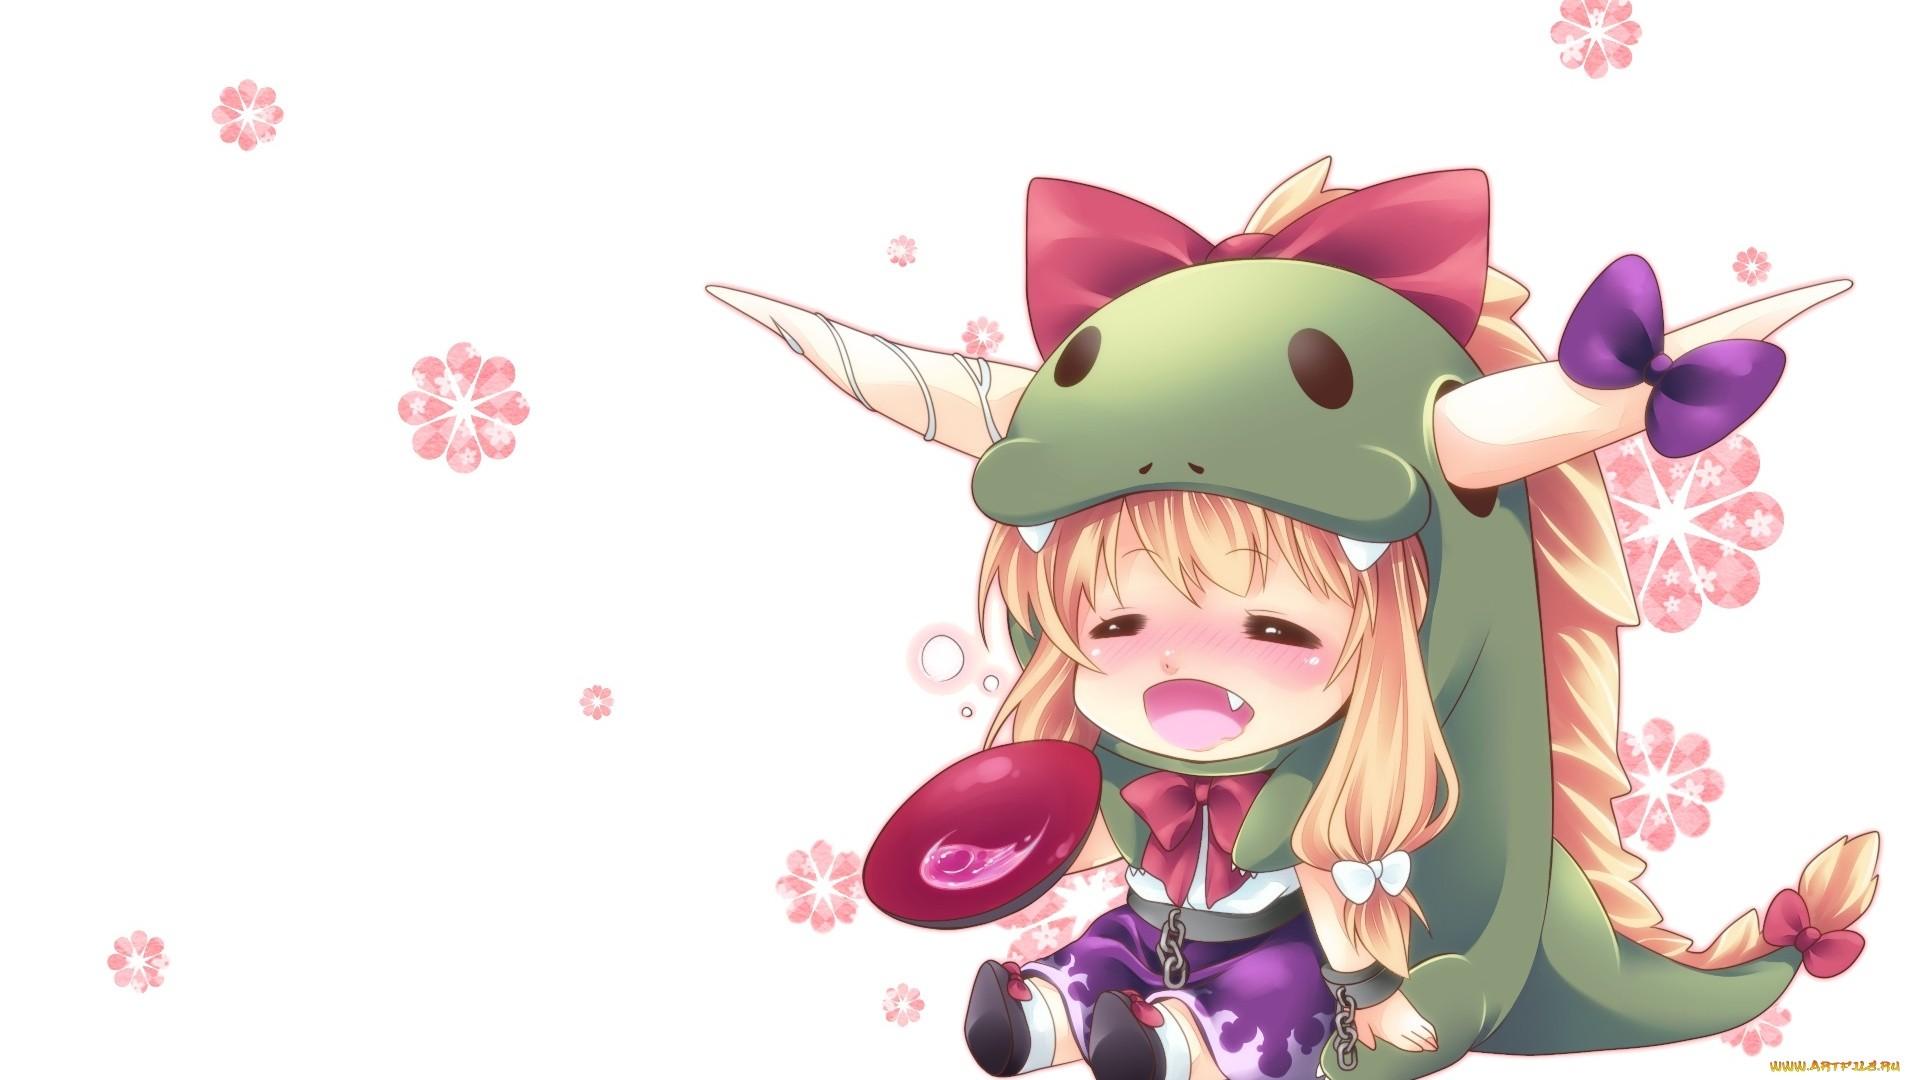 Chibi Anime Girl Desktop Wallpaper